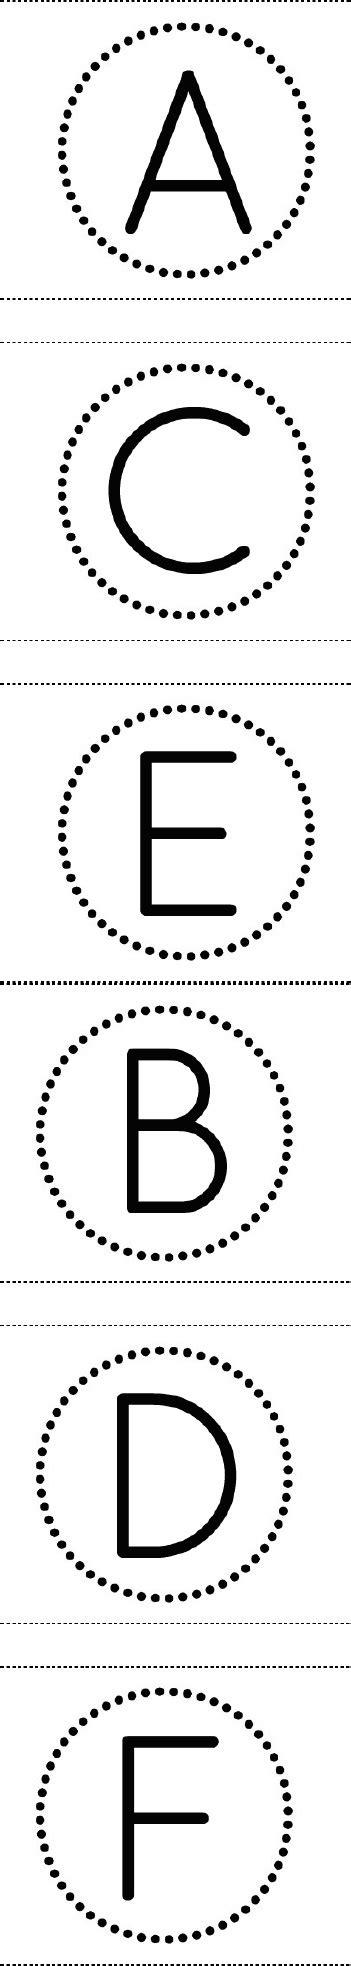 printable alphabet in circles free printable circle banner alphabet for making